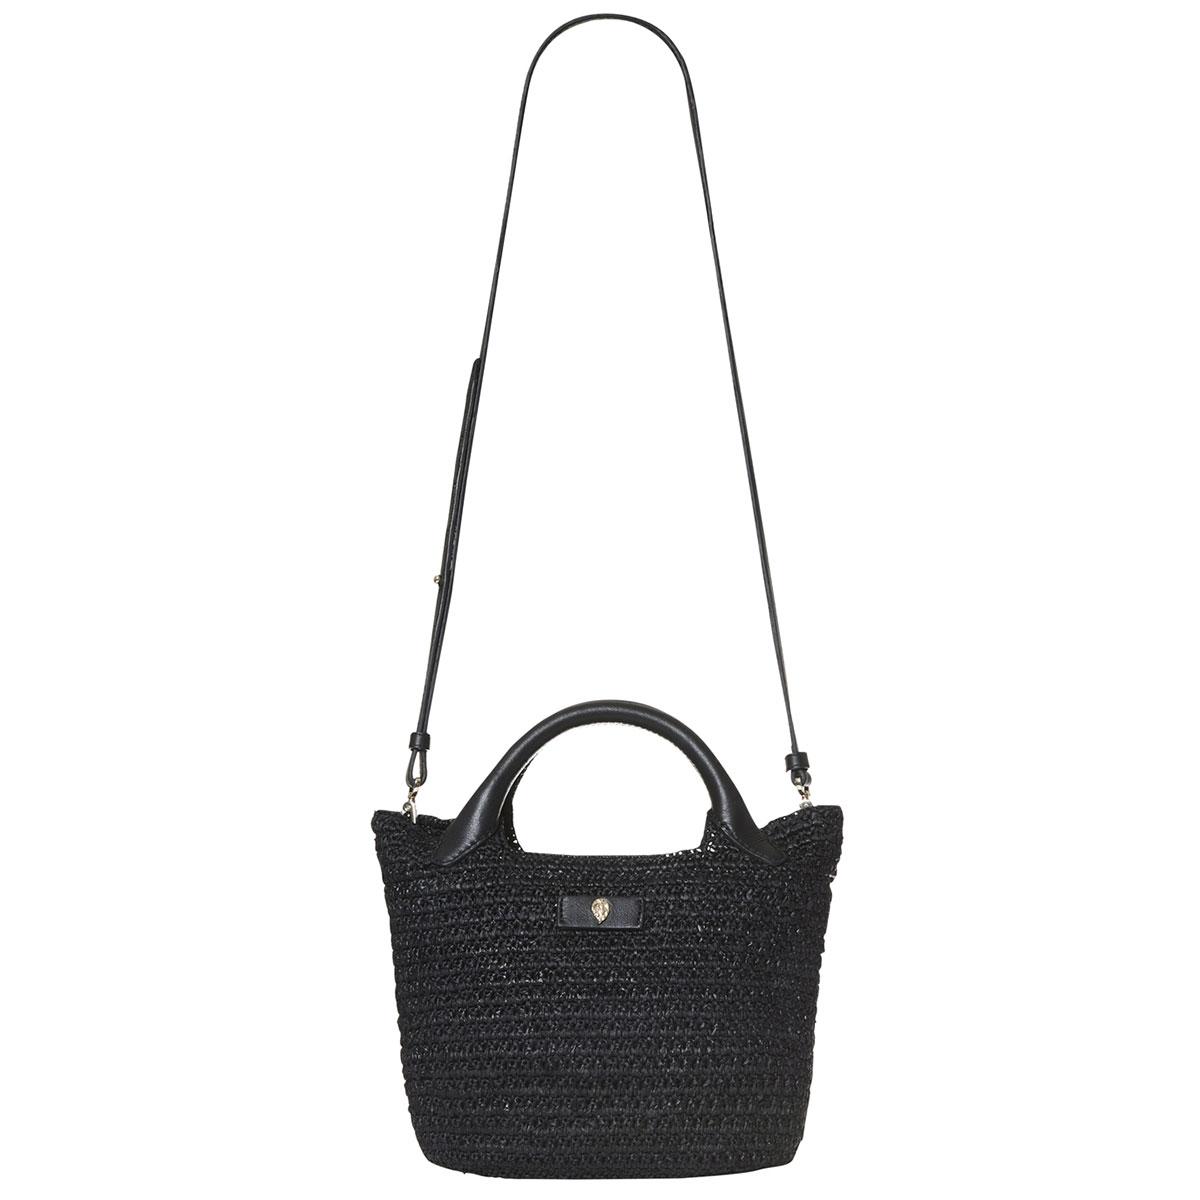 Helen Kaminski Cassia Mini Basket in Charcoal,Black